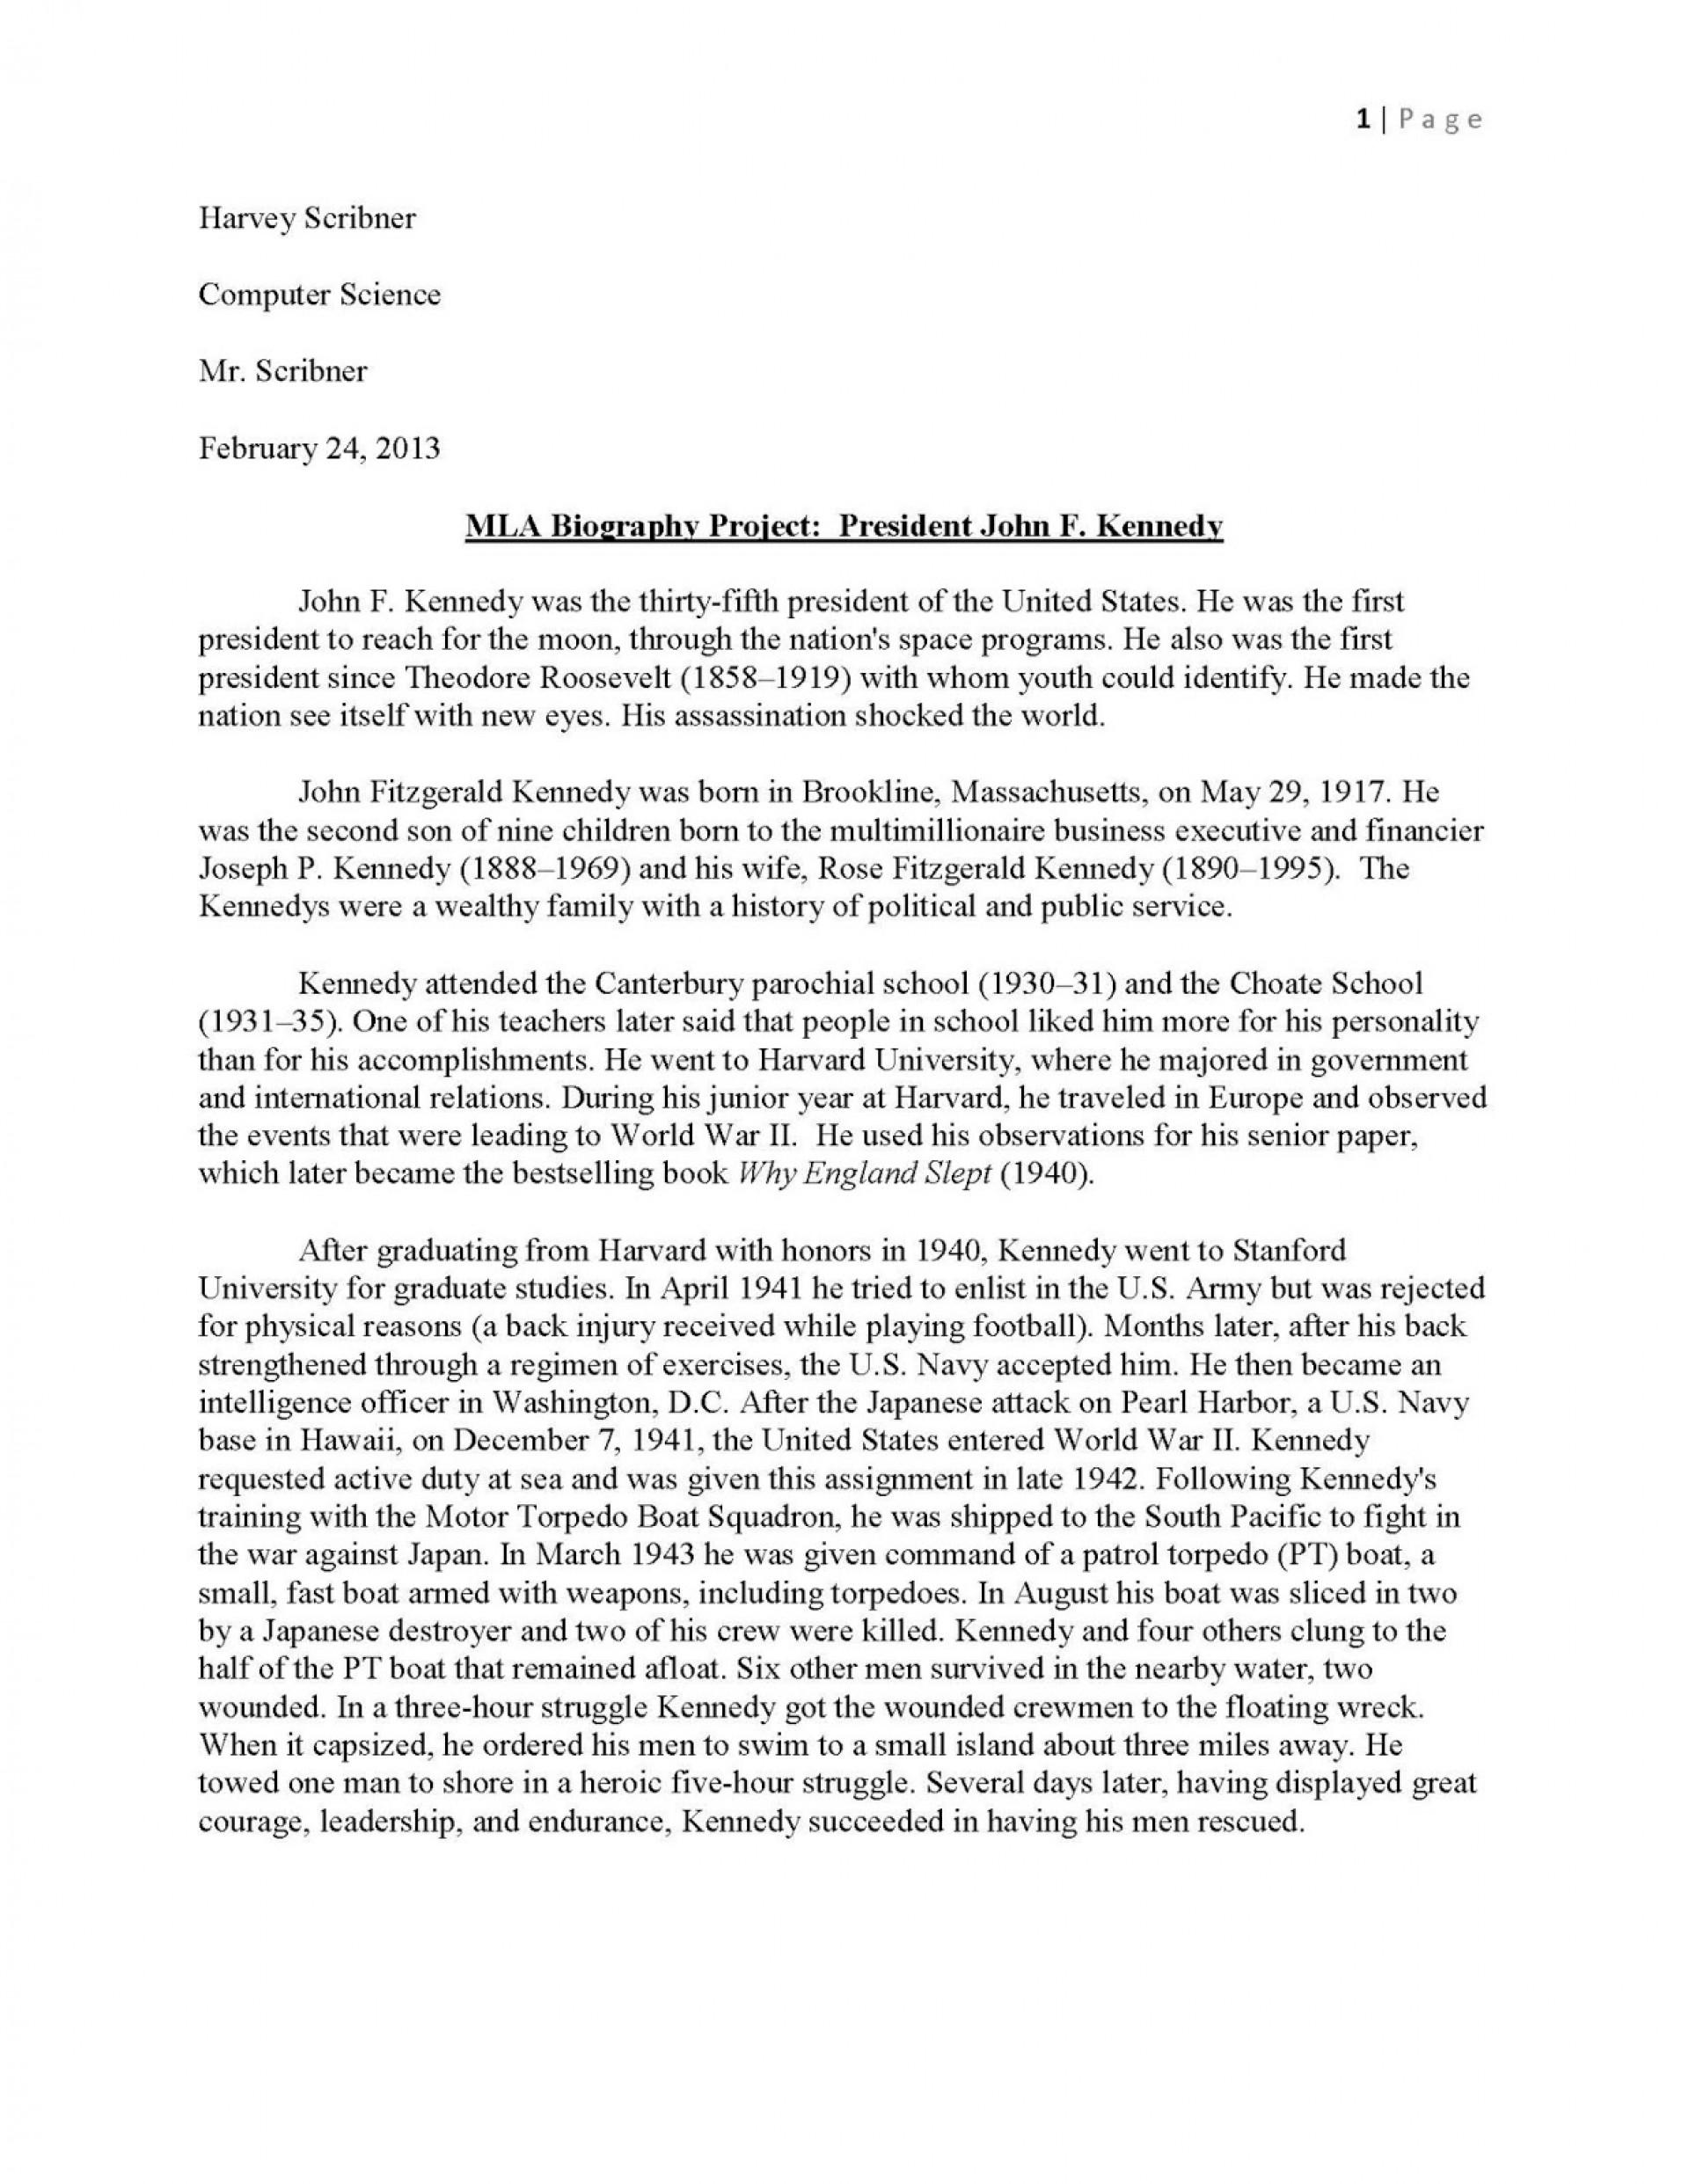 025 Essay Example Jfkmlashortformbiographyreportexample Page 1 Surprising Autobiography Sample Pdf For Highschool Students 1920